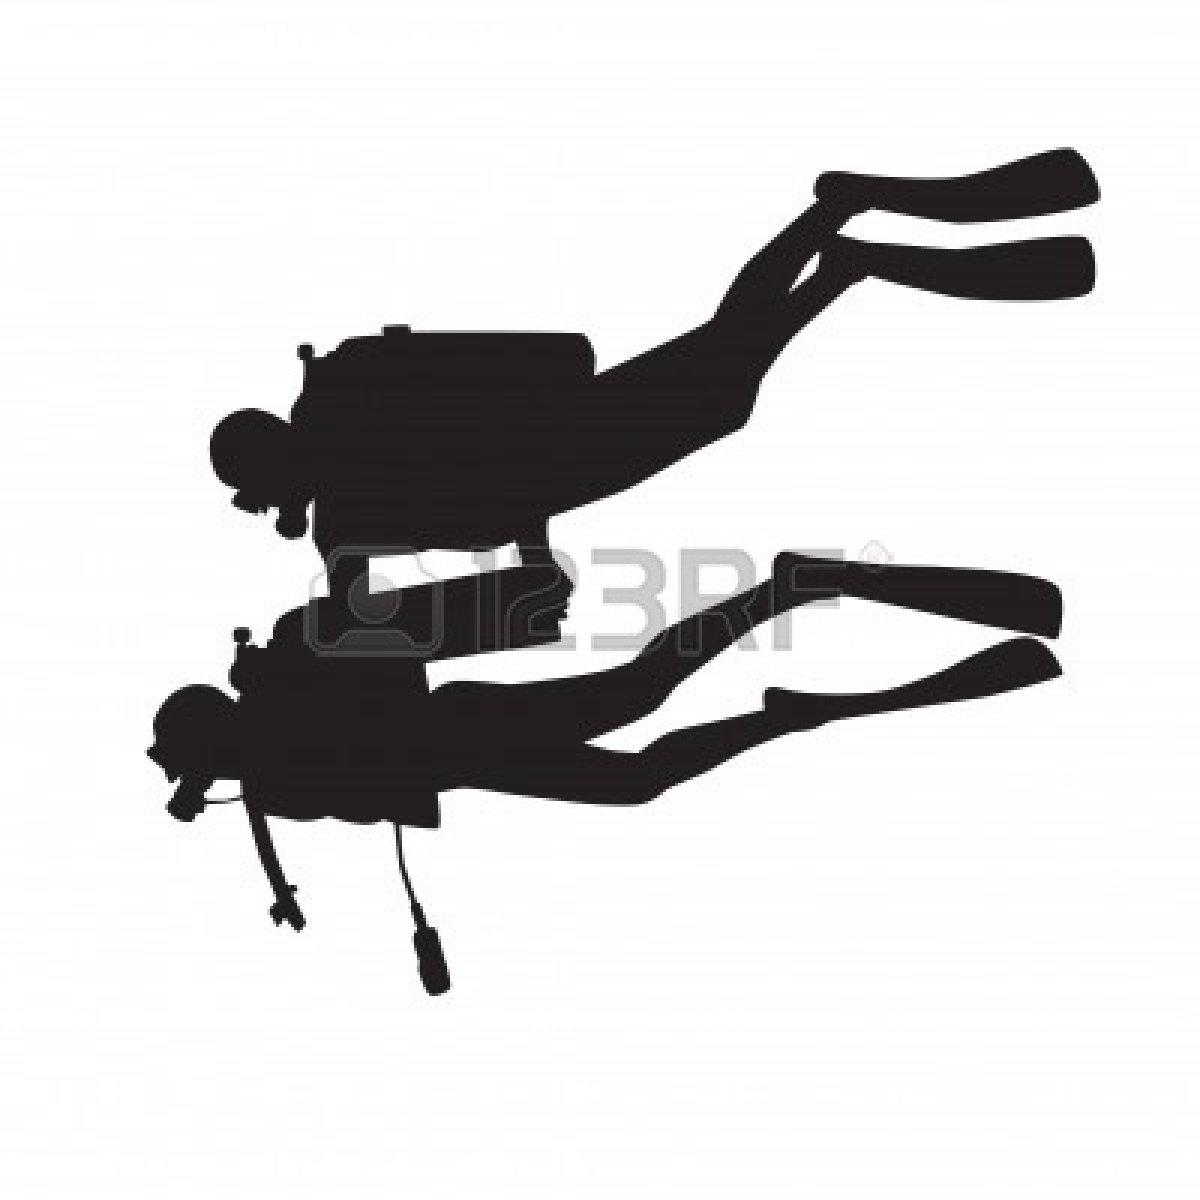 Scuba Diver Art Scuba%20clipart